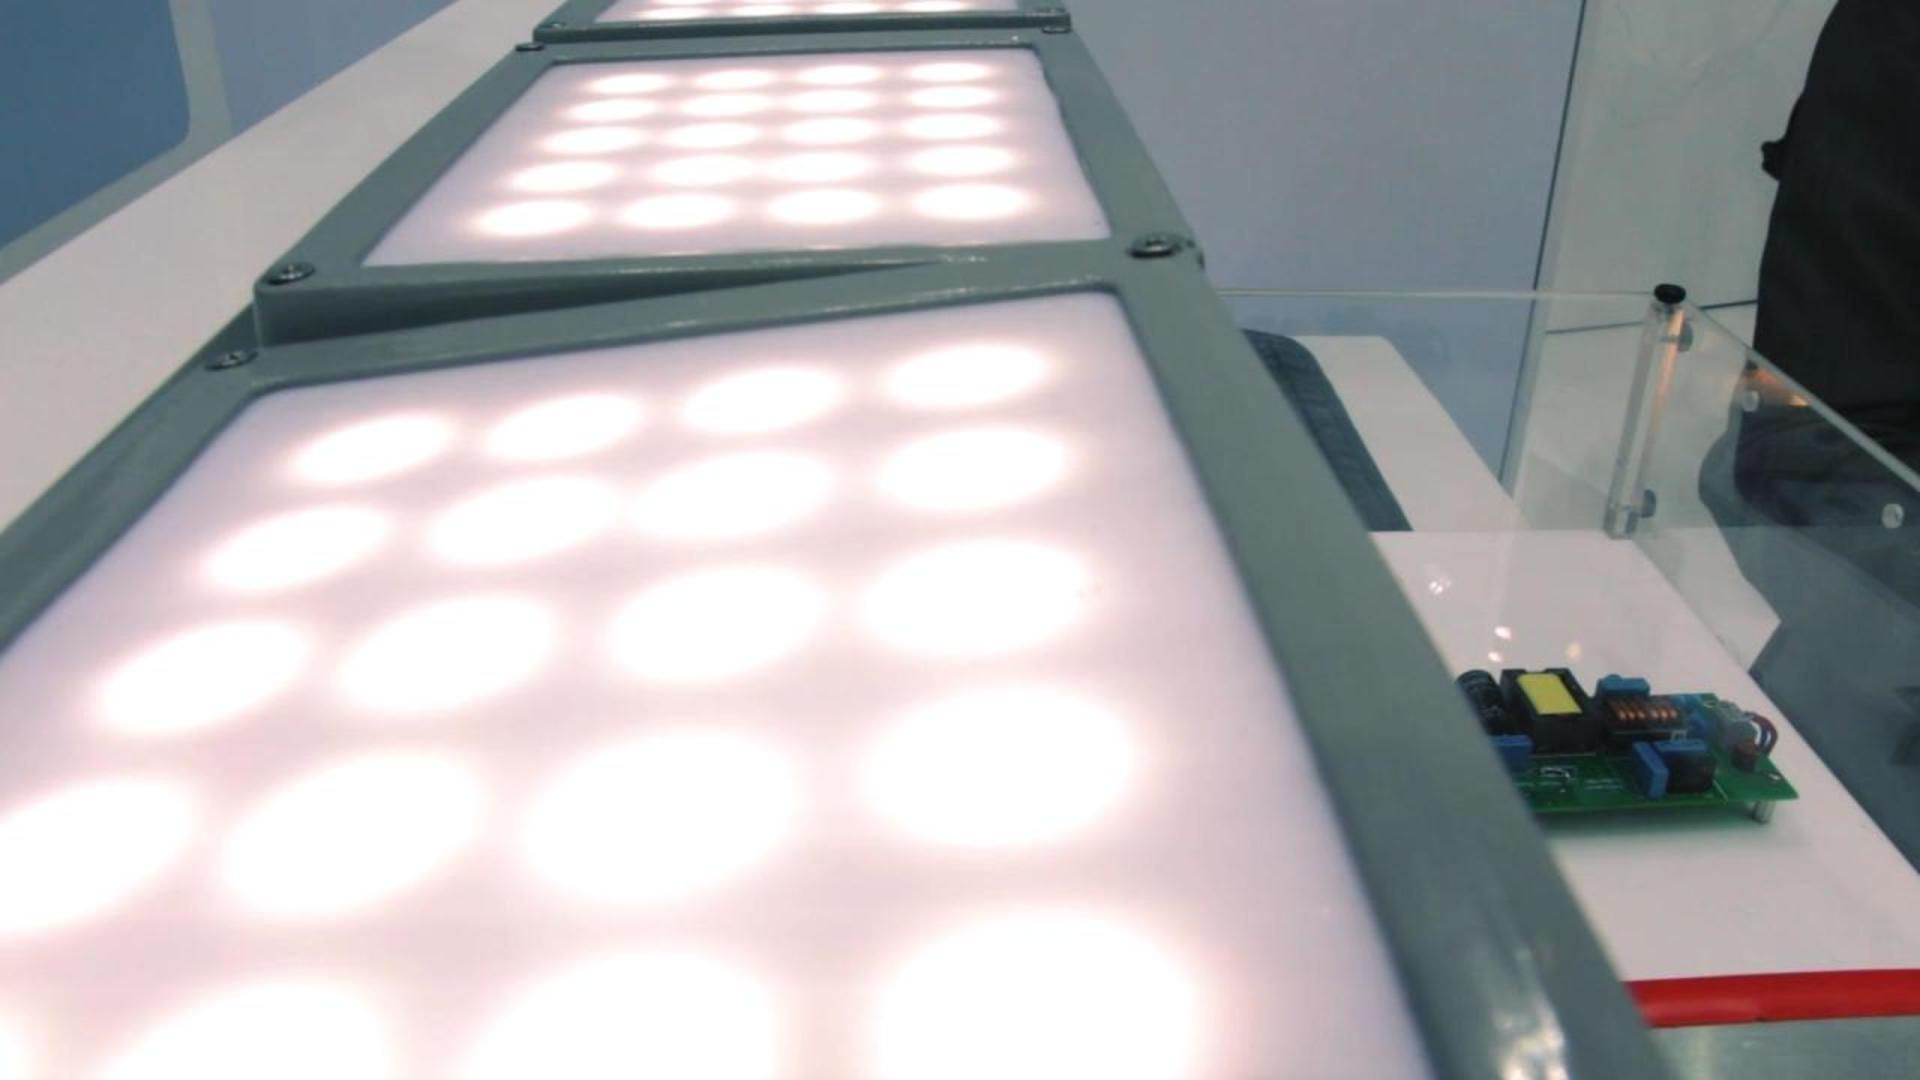 LED Lighting Demonstration at electronica 2014